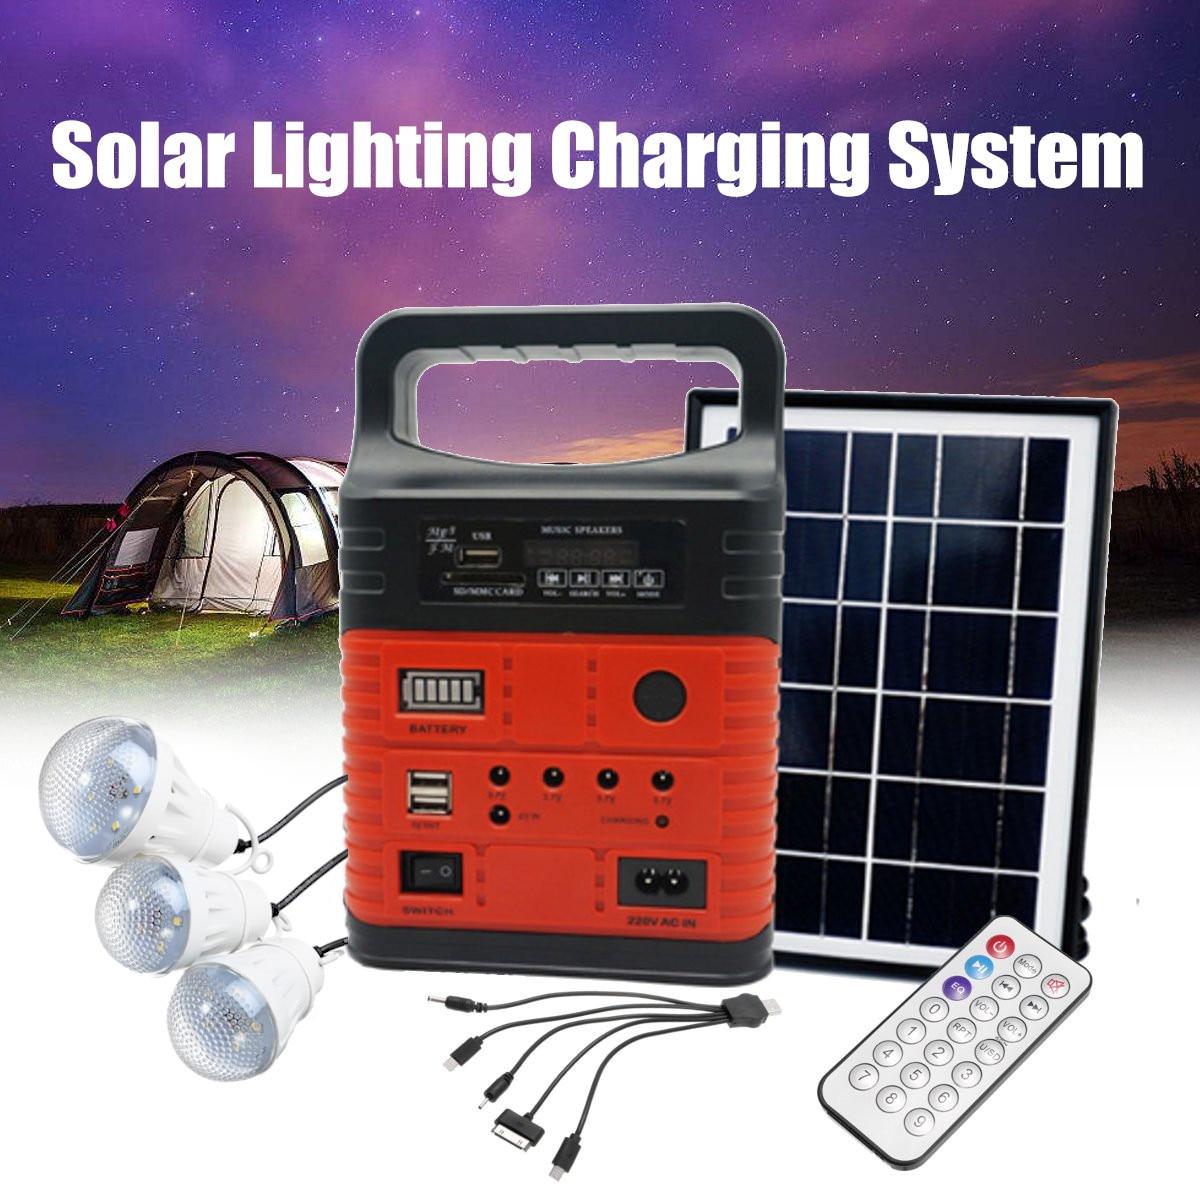 3 LED Solar Beleuchtung System Kit 7500mAH USB Lade Haushalt Generator Kit Outdoor Power Versorgung MP3 Radio Taschenlampe Notfall